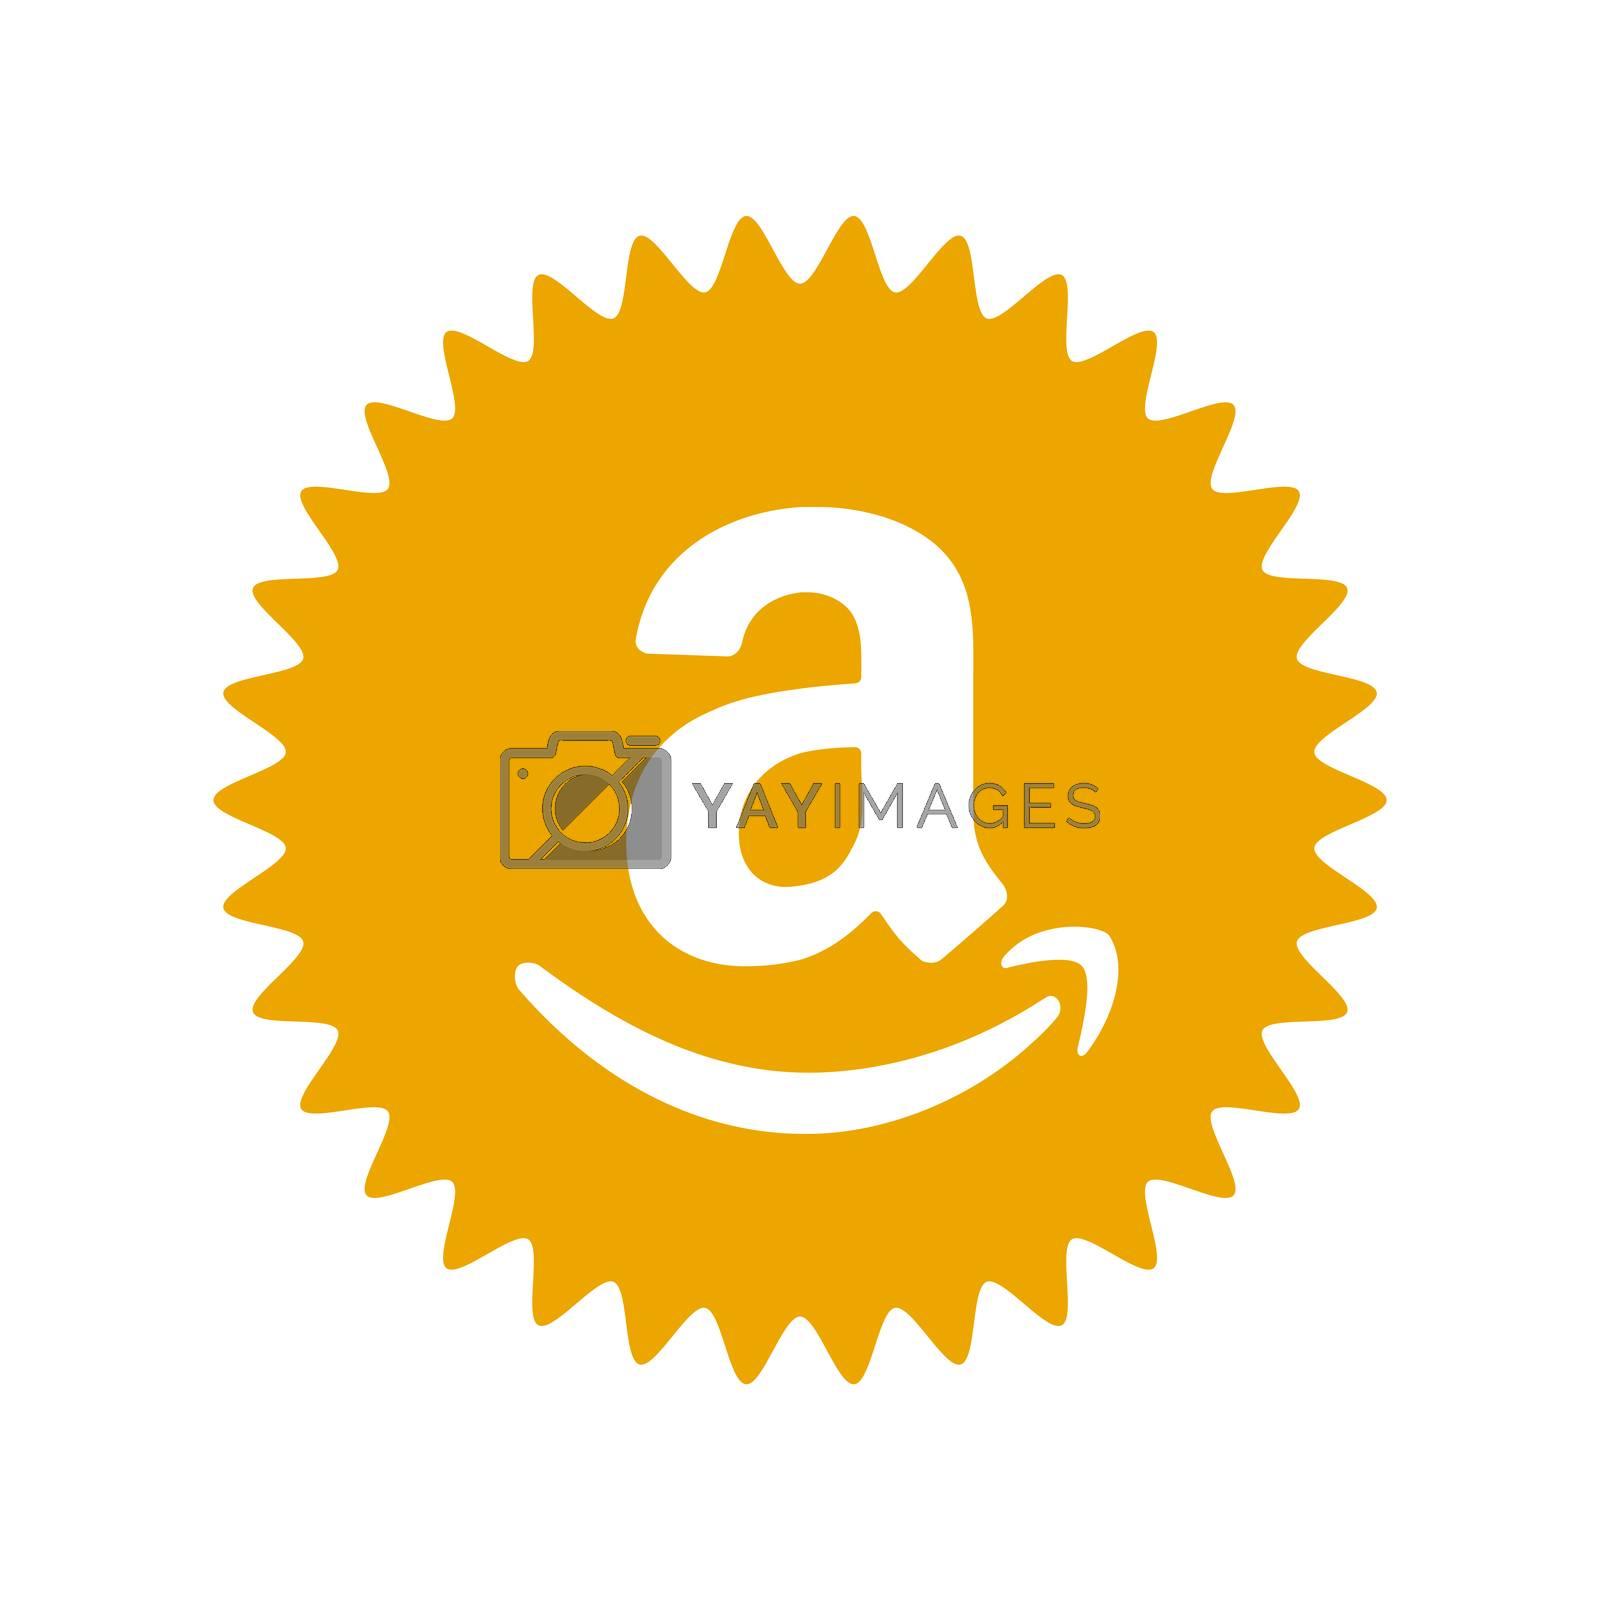 Amazon logo. Amazon icon app application logo. Amazon is American international electronic commerce company . Kharkiv, Ukraine - June, 2020